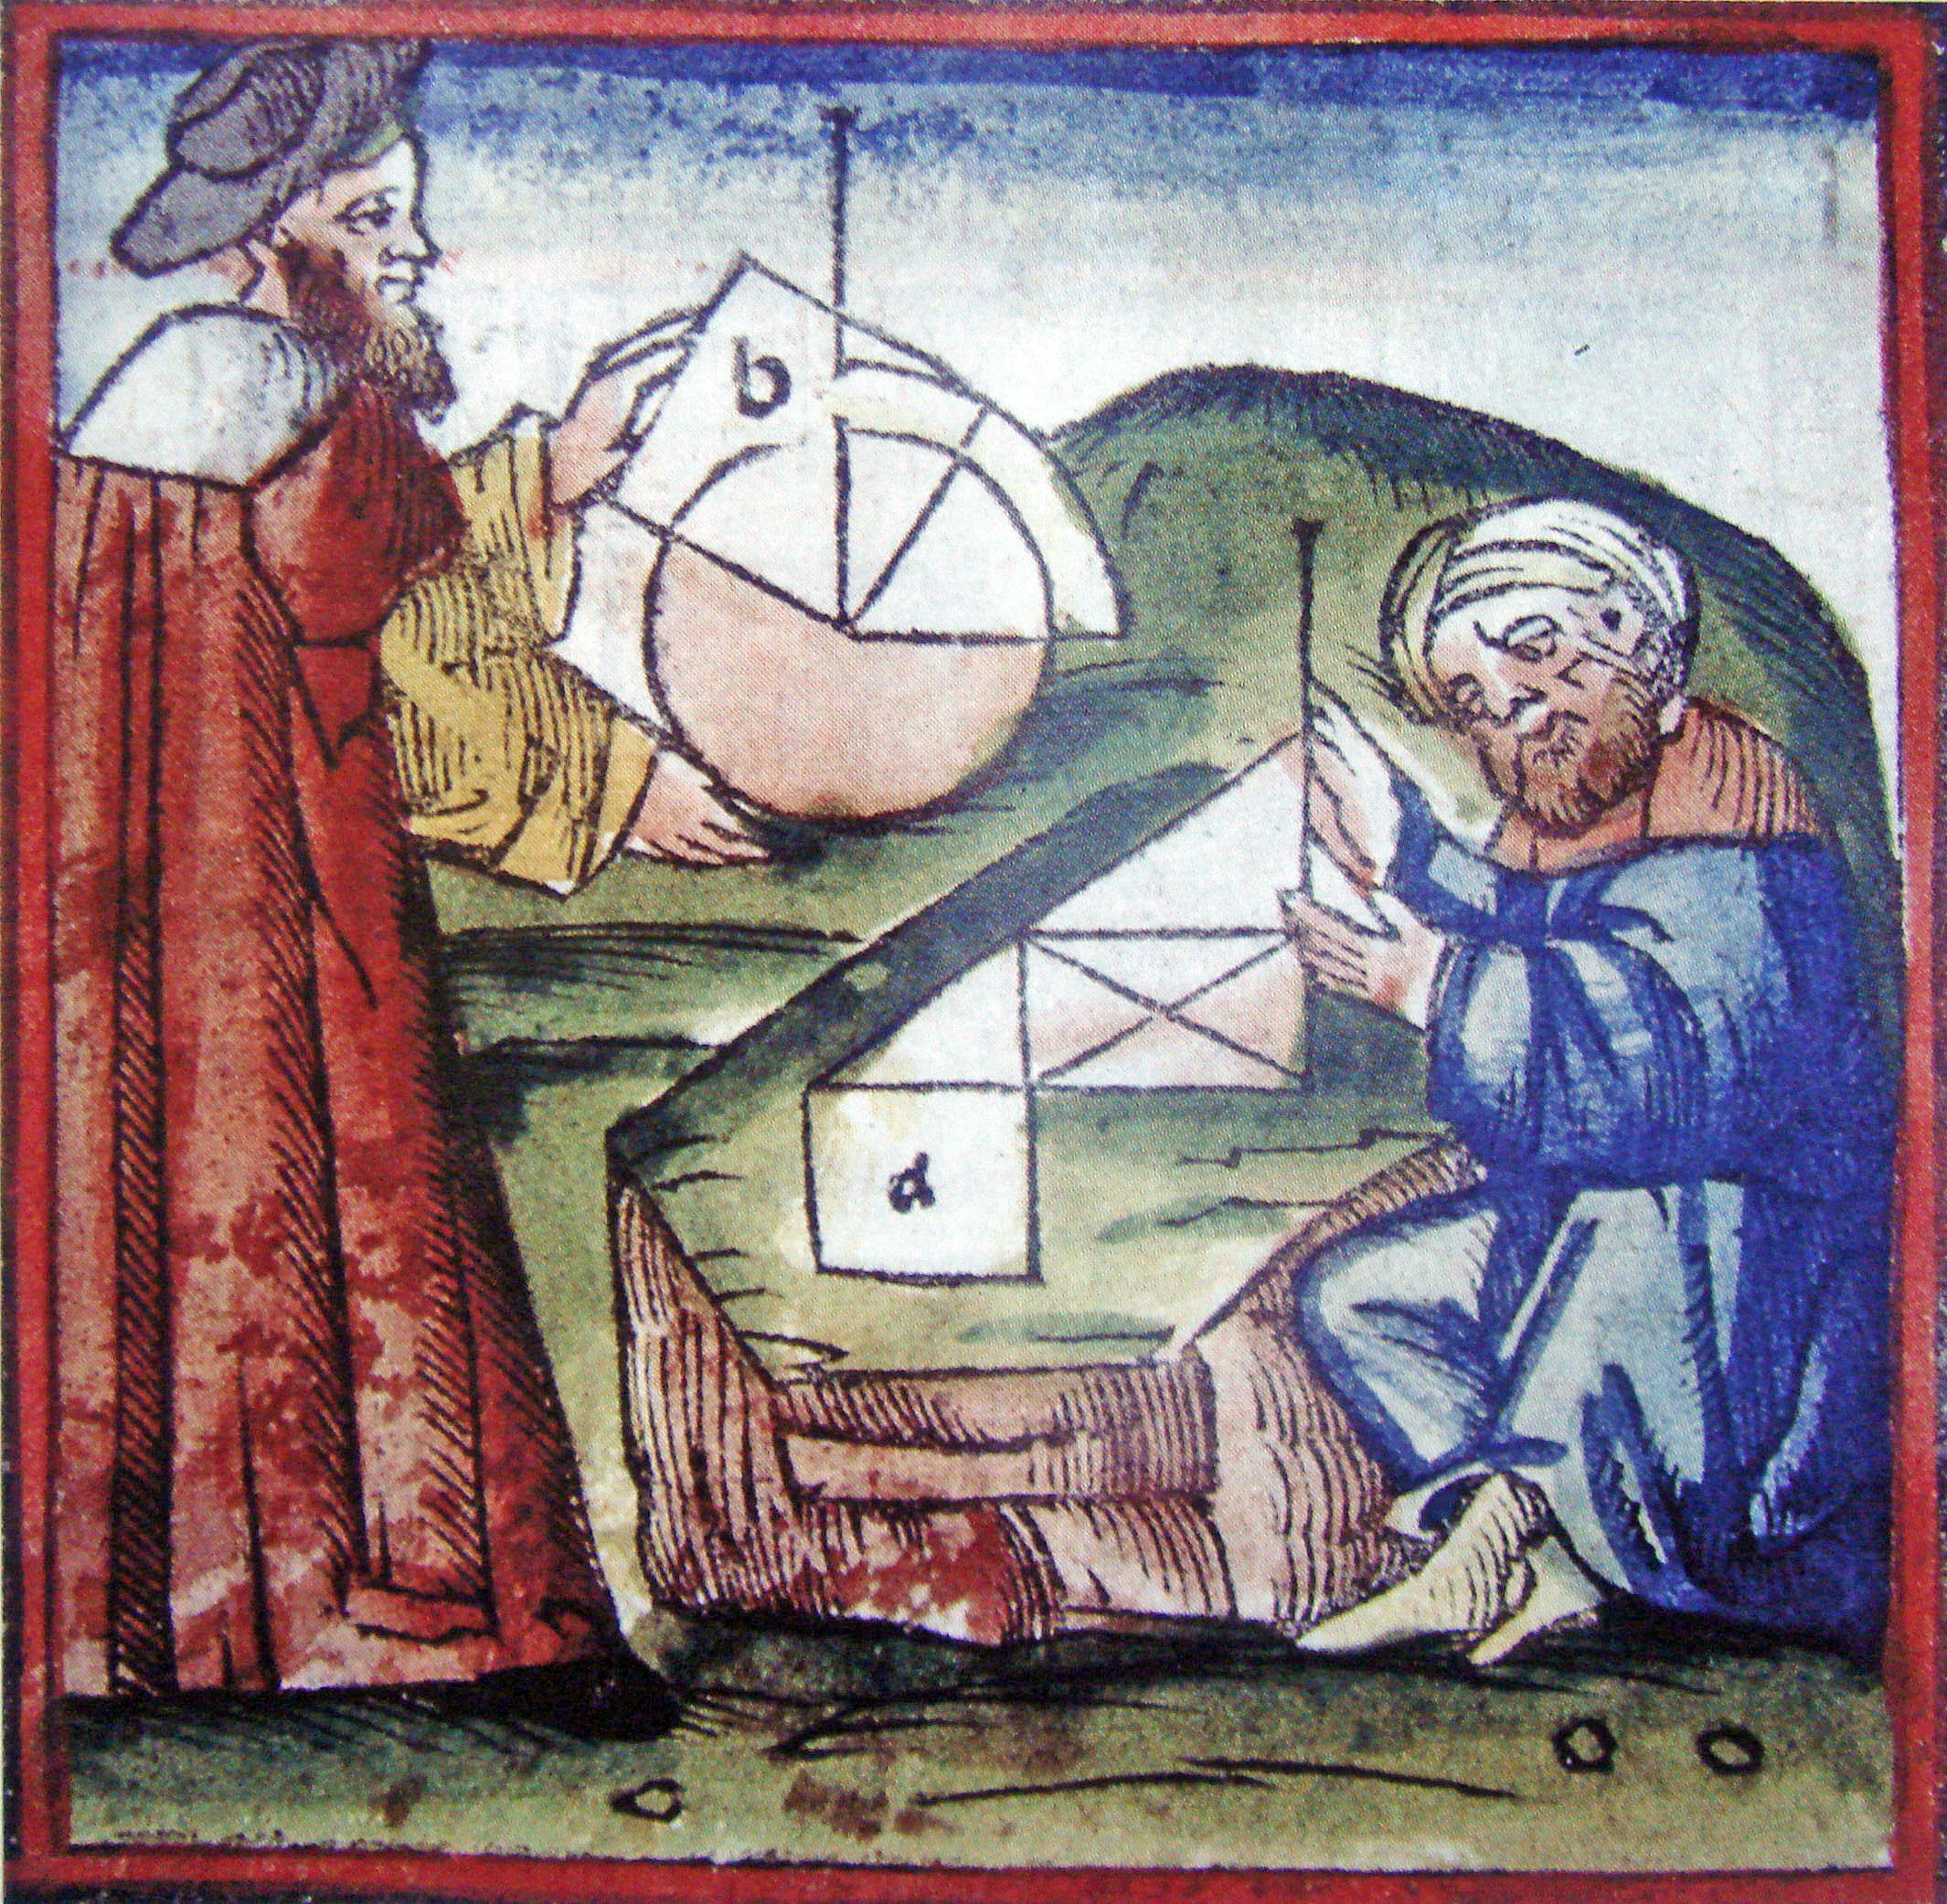 westerner_and_arab_practicing_geometry_15th_century_manuscript.jpg